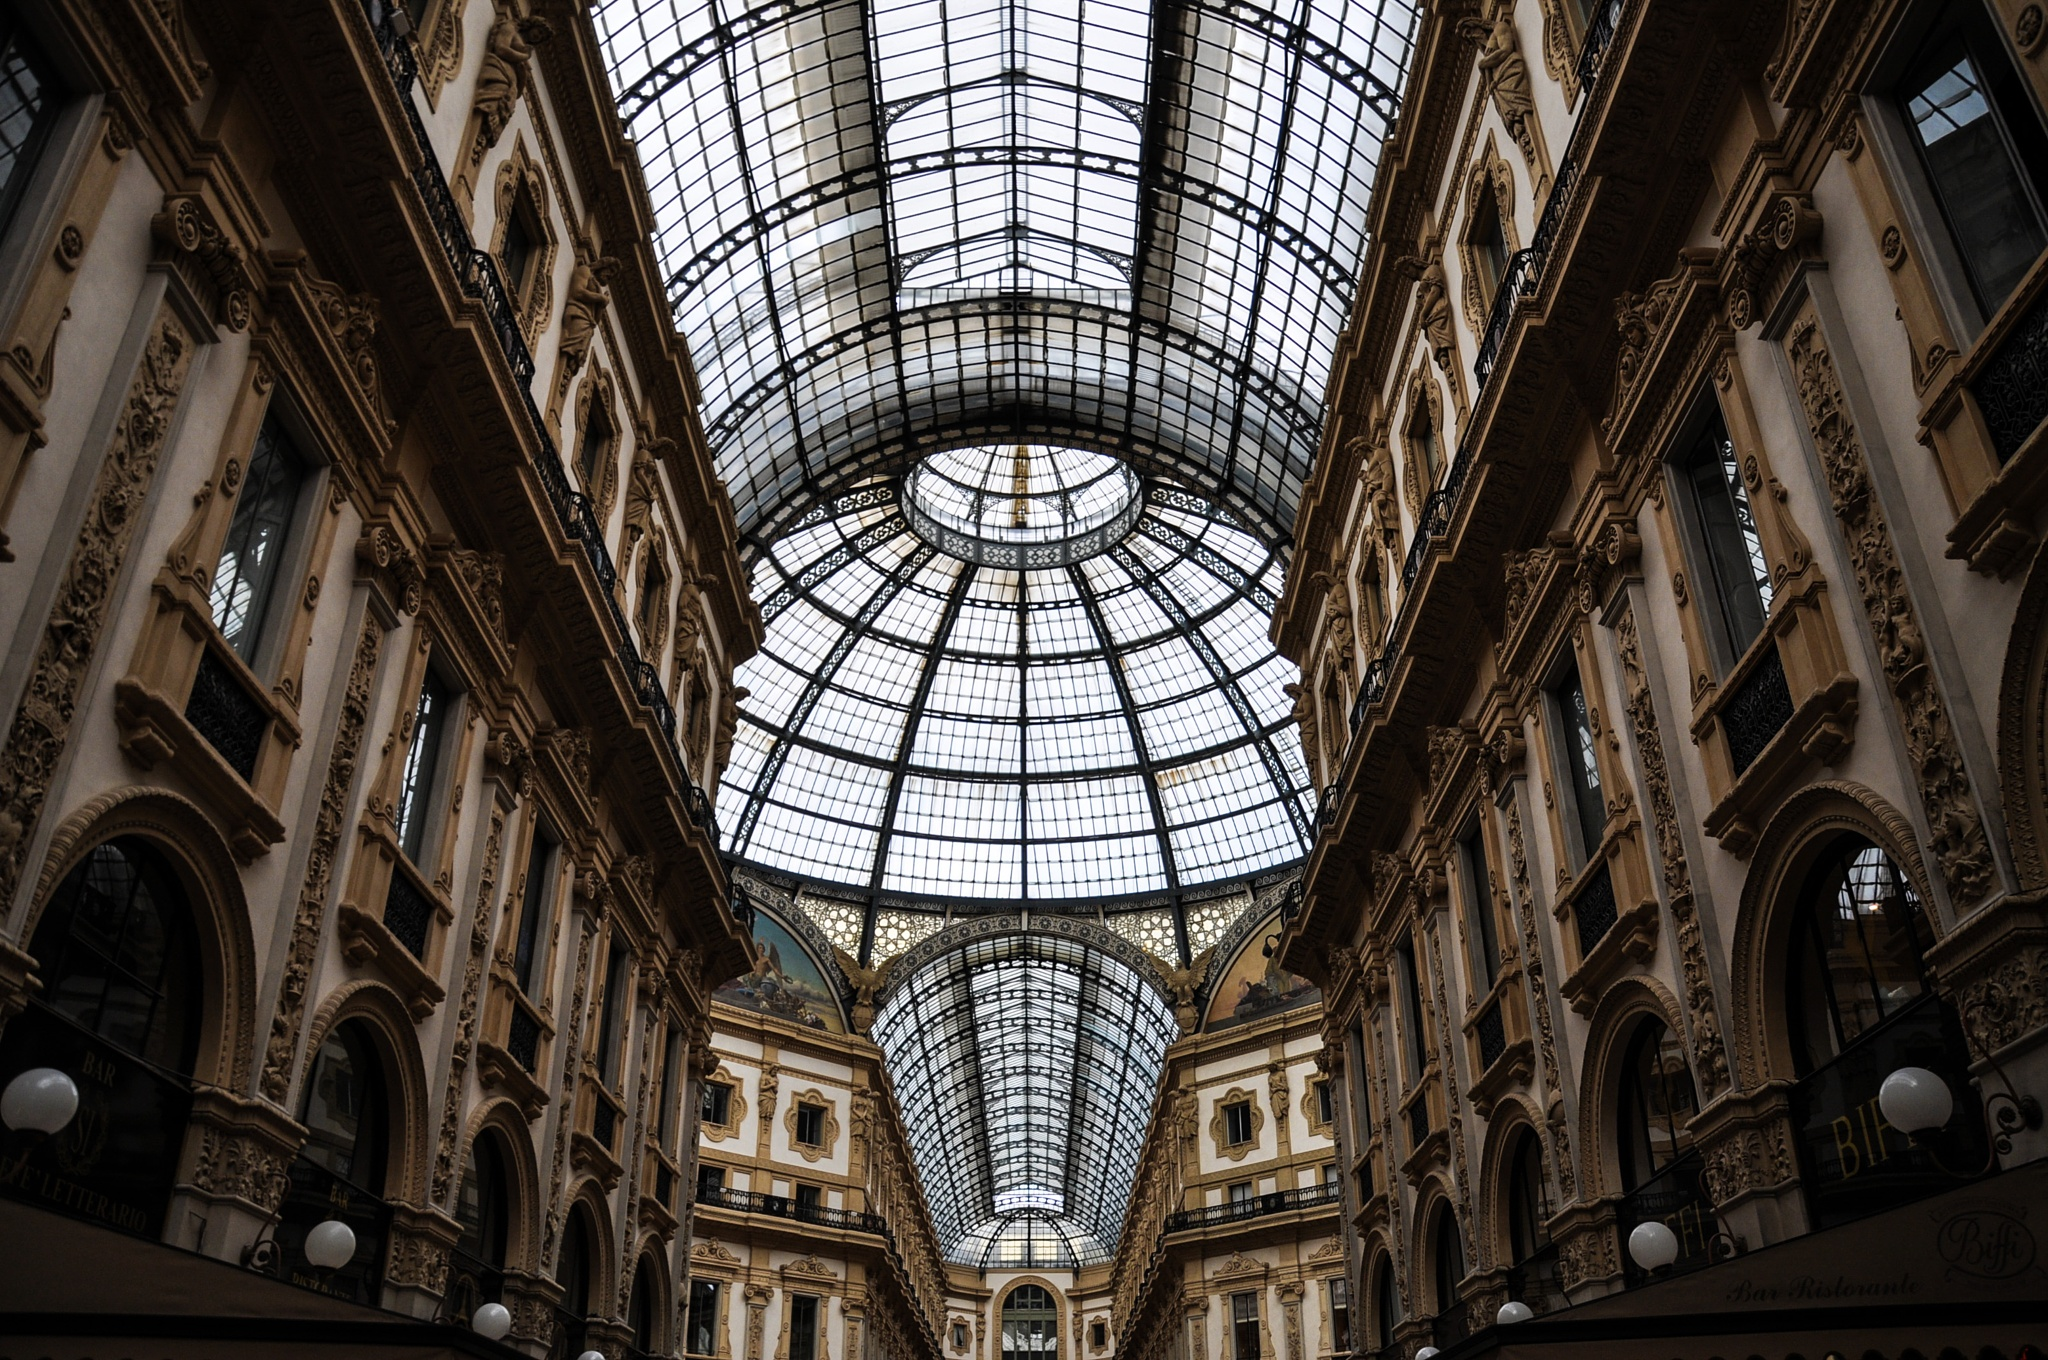 Milan Center by Rudy Tarrazona Guacena